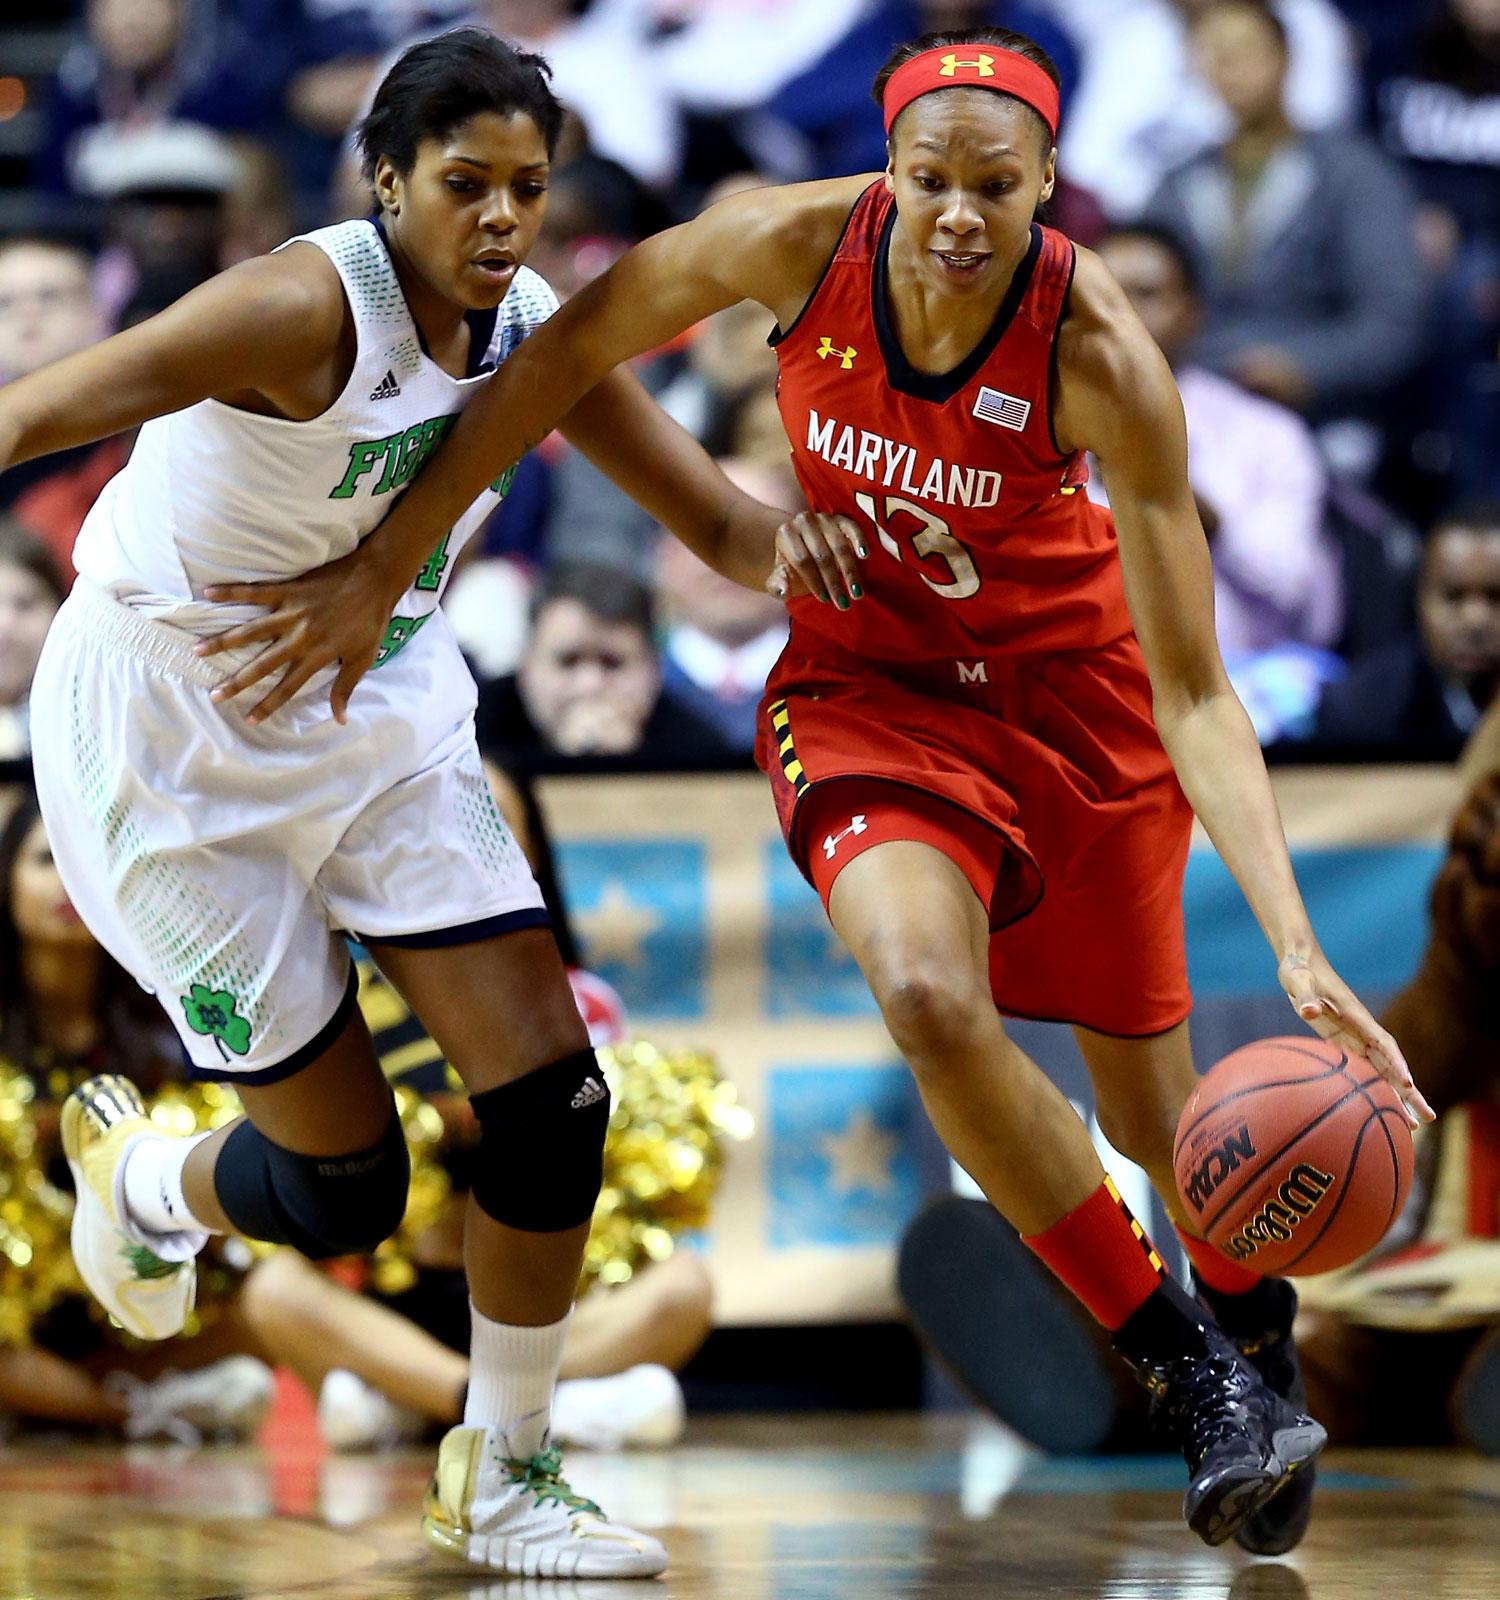 NCAA Men's Tournament overshadows Women's Tournament